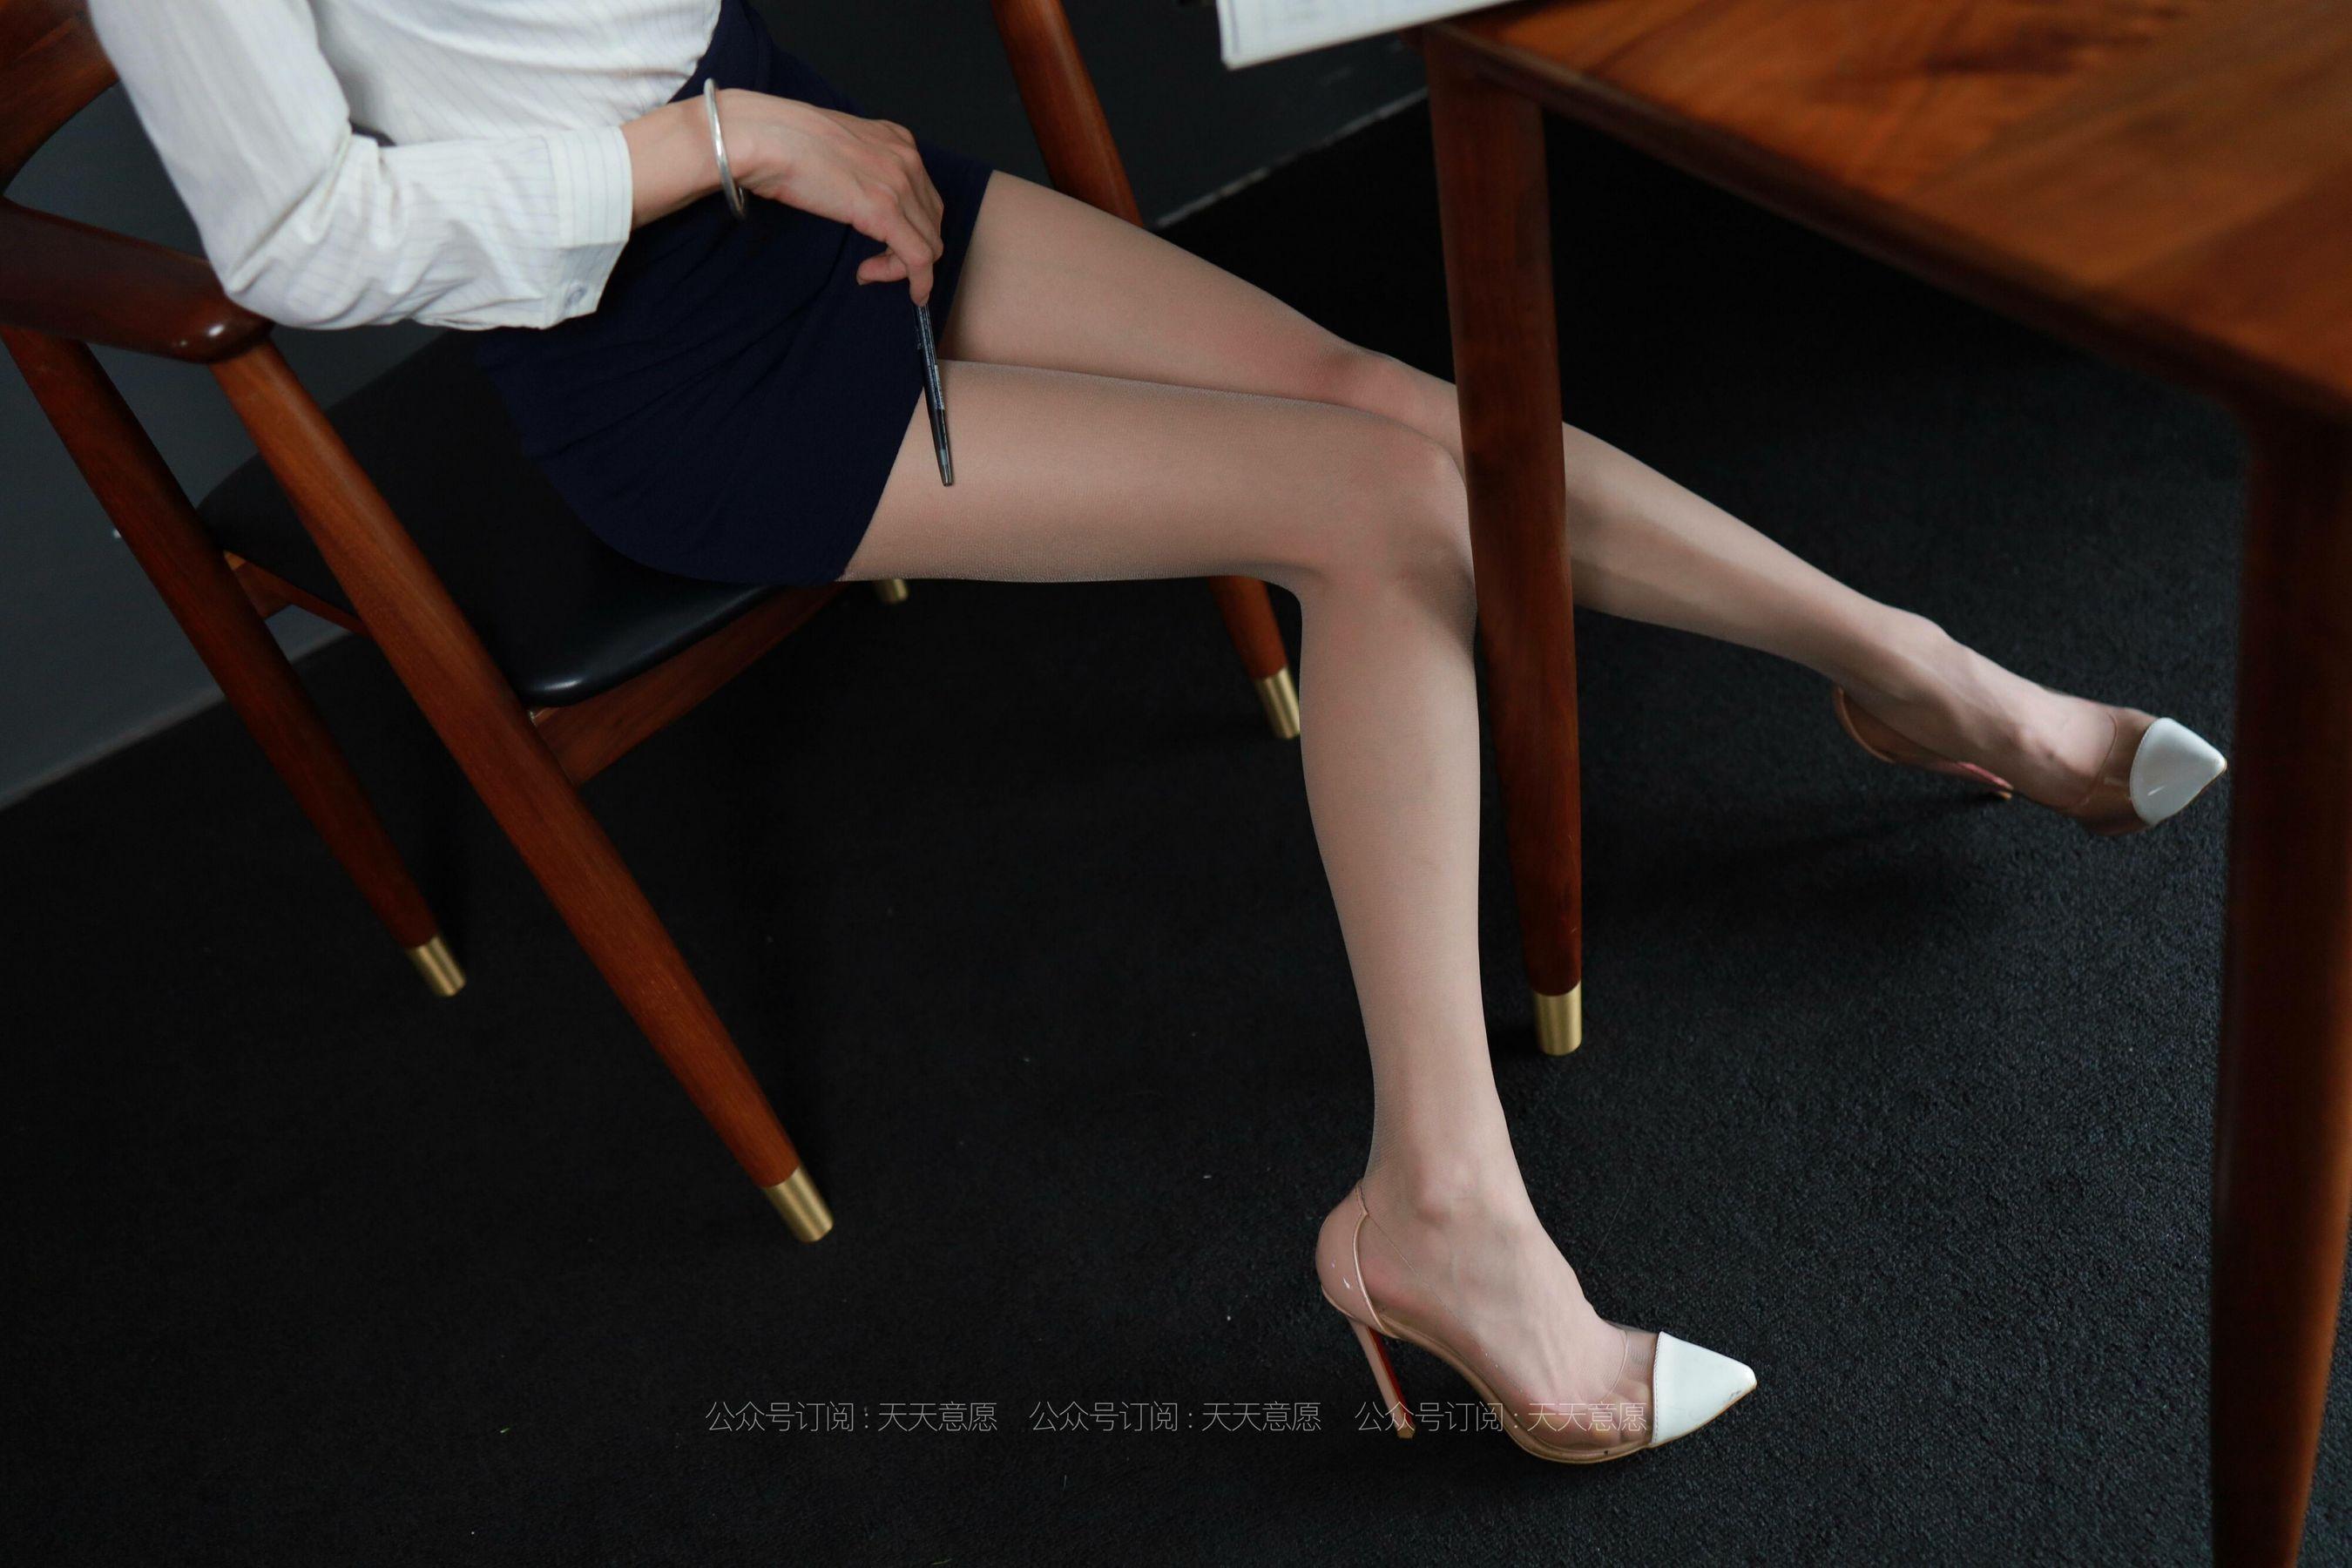 [IESS] 丝享家813: 小六《火辣女秘书》[88P]插图(3)